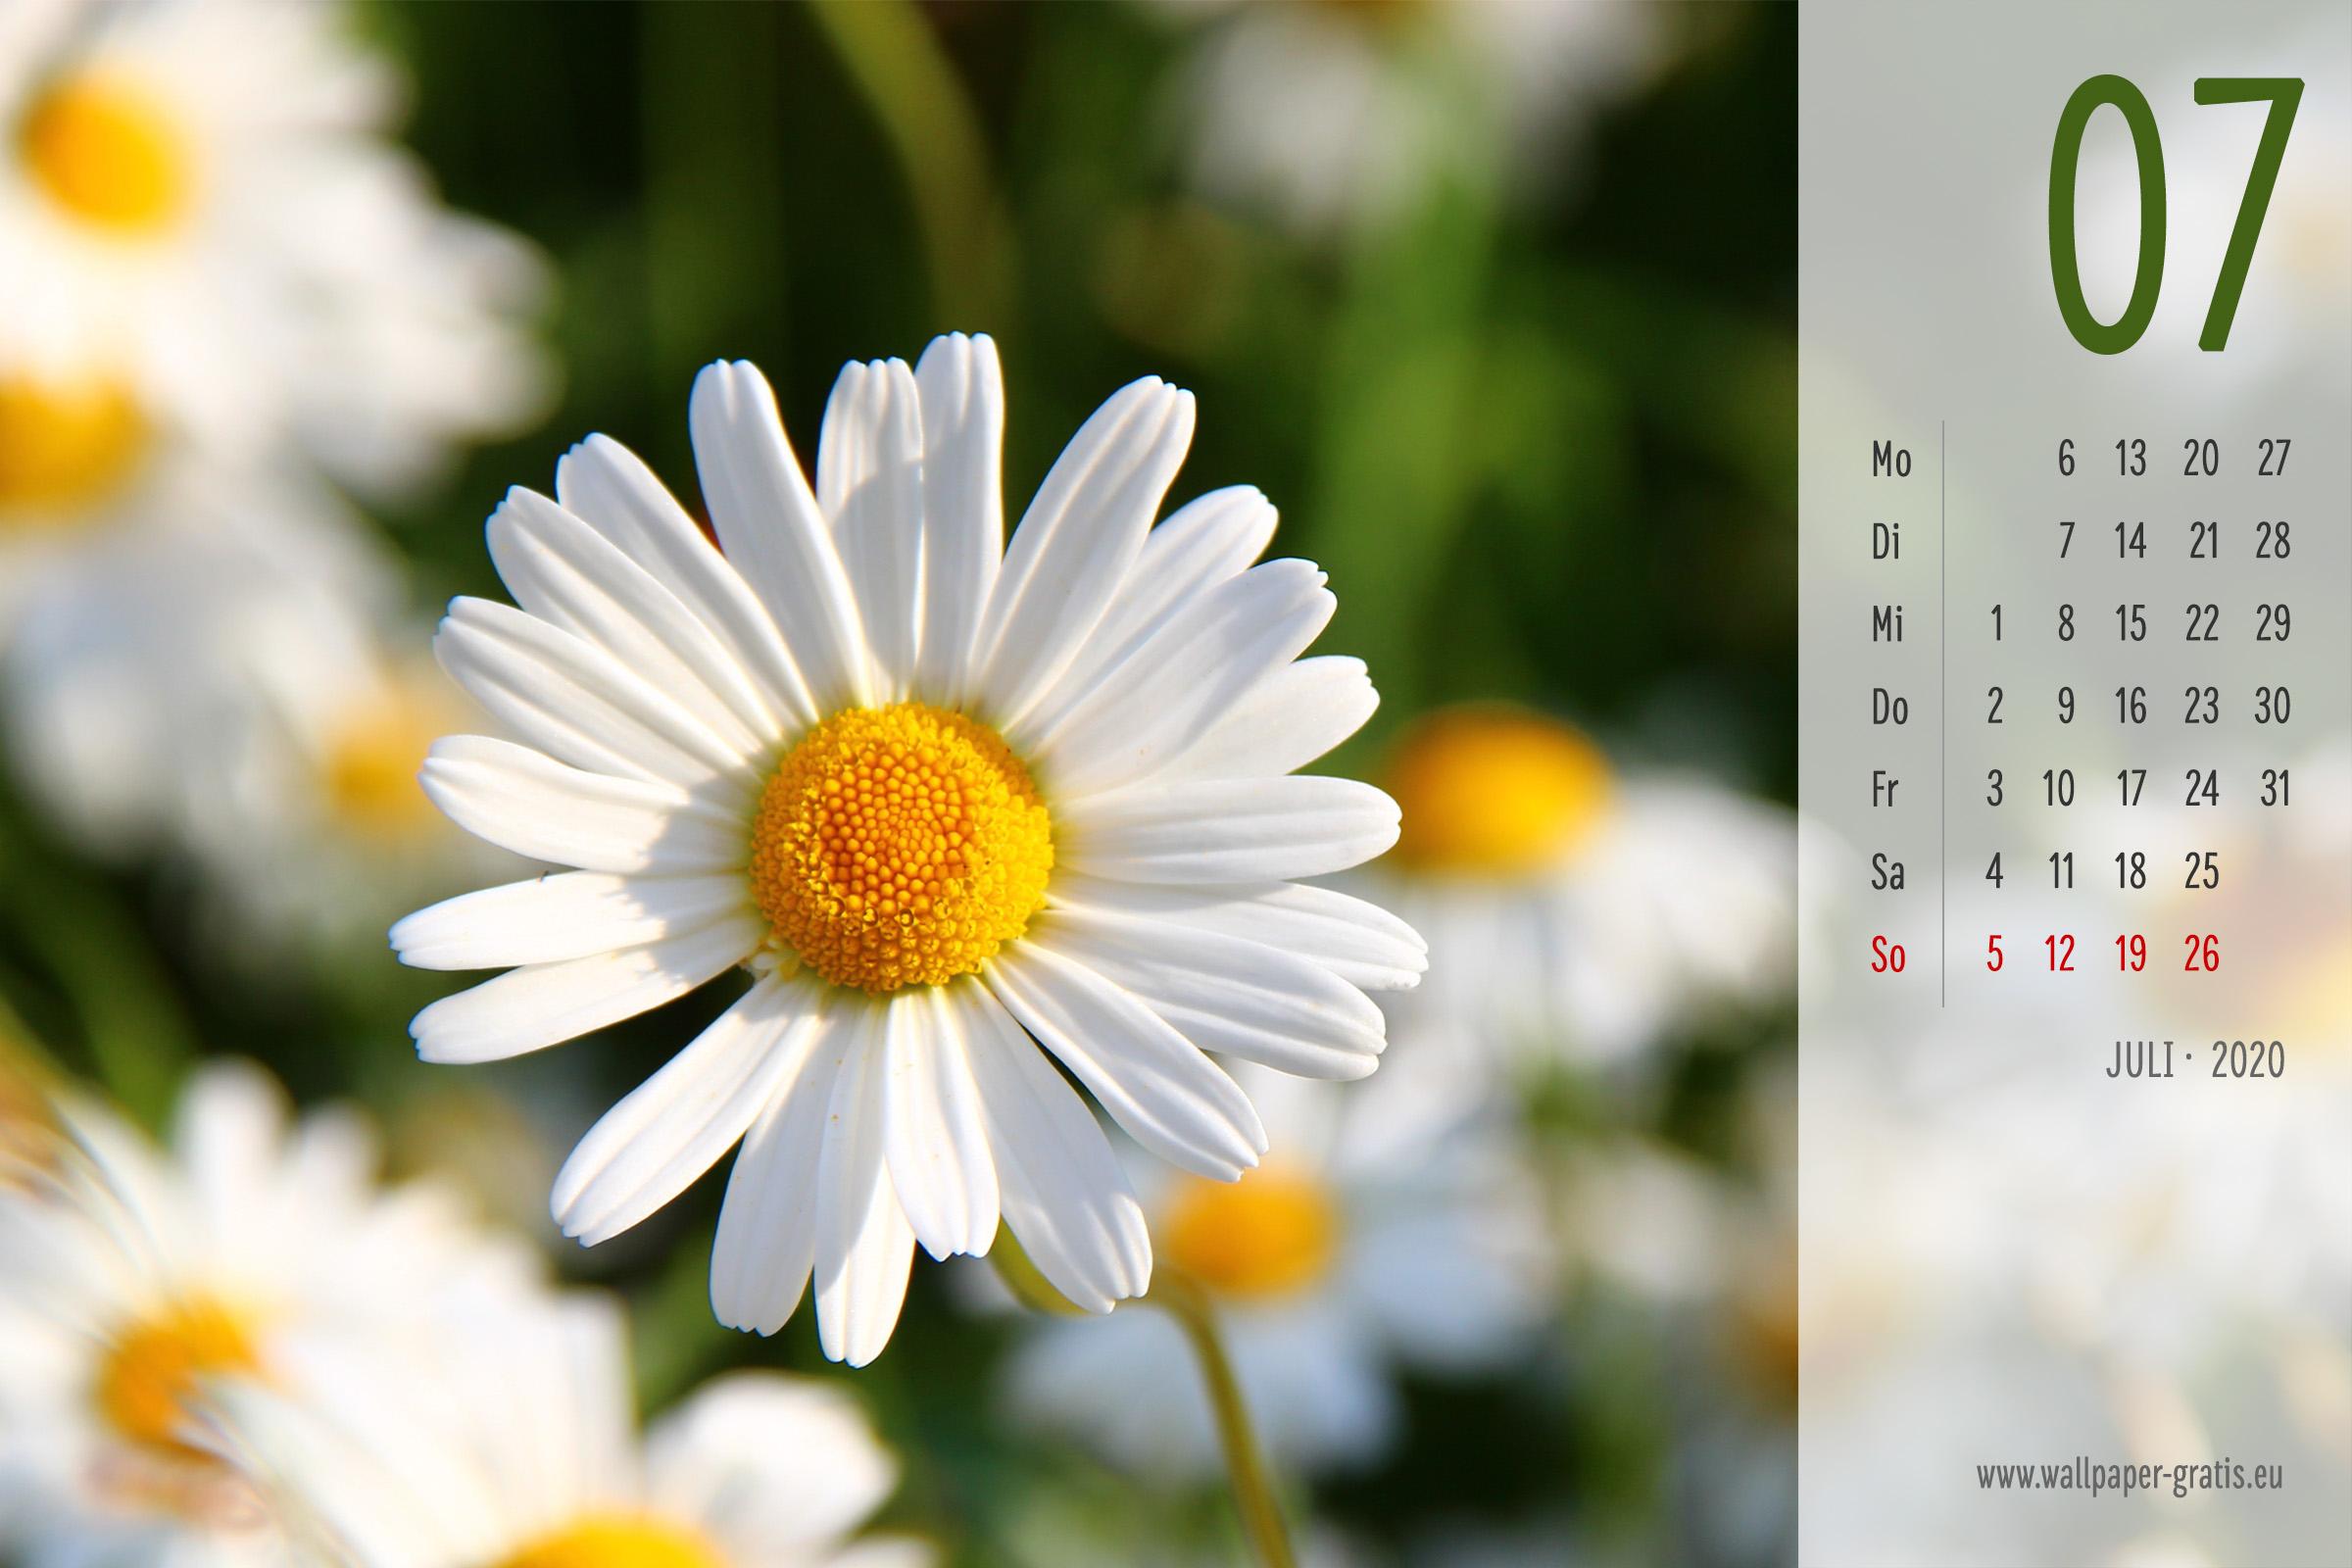 Blume Kalender 2020 Kostenlose Kalenderbl 228 Tter